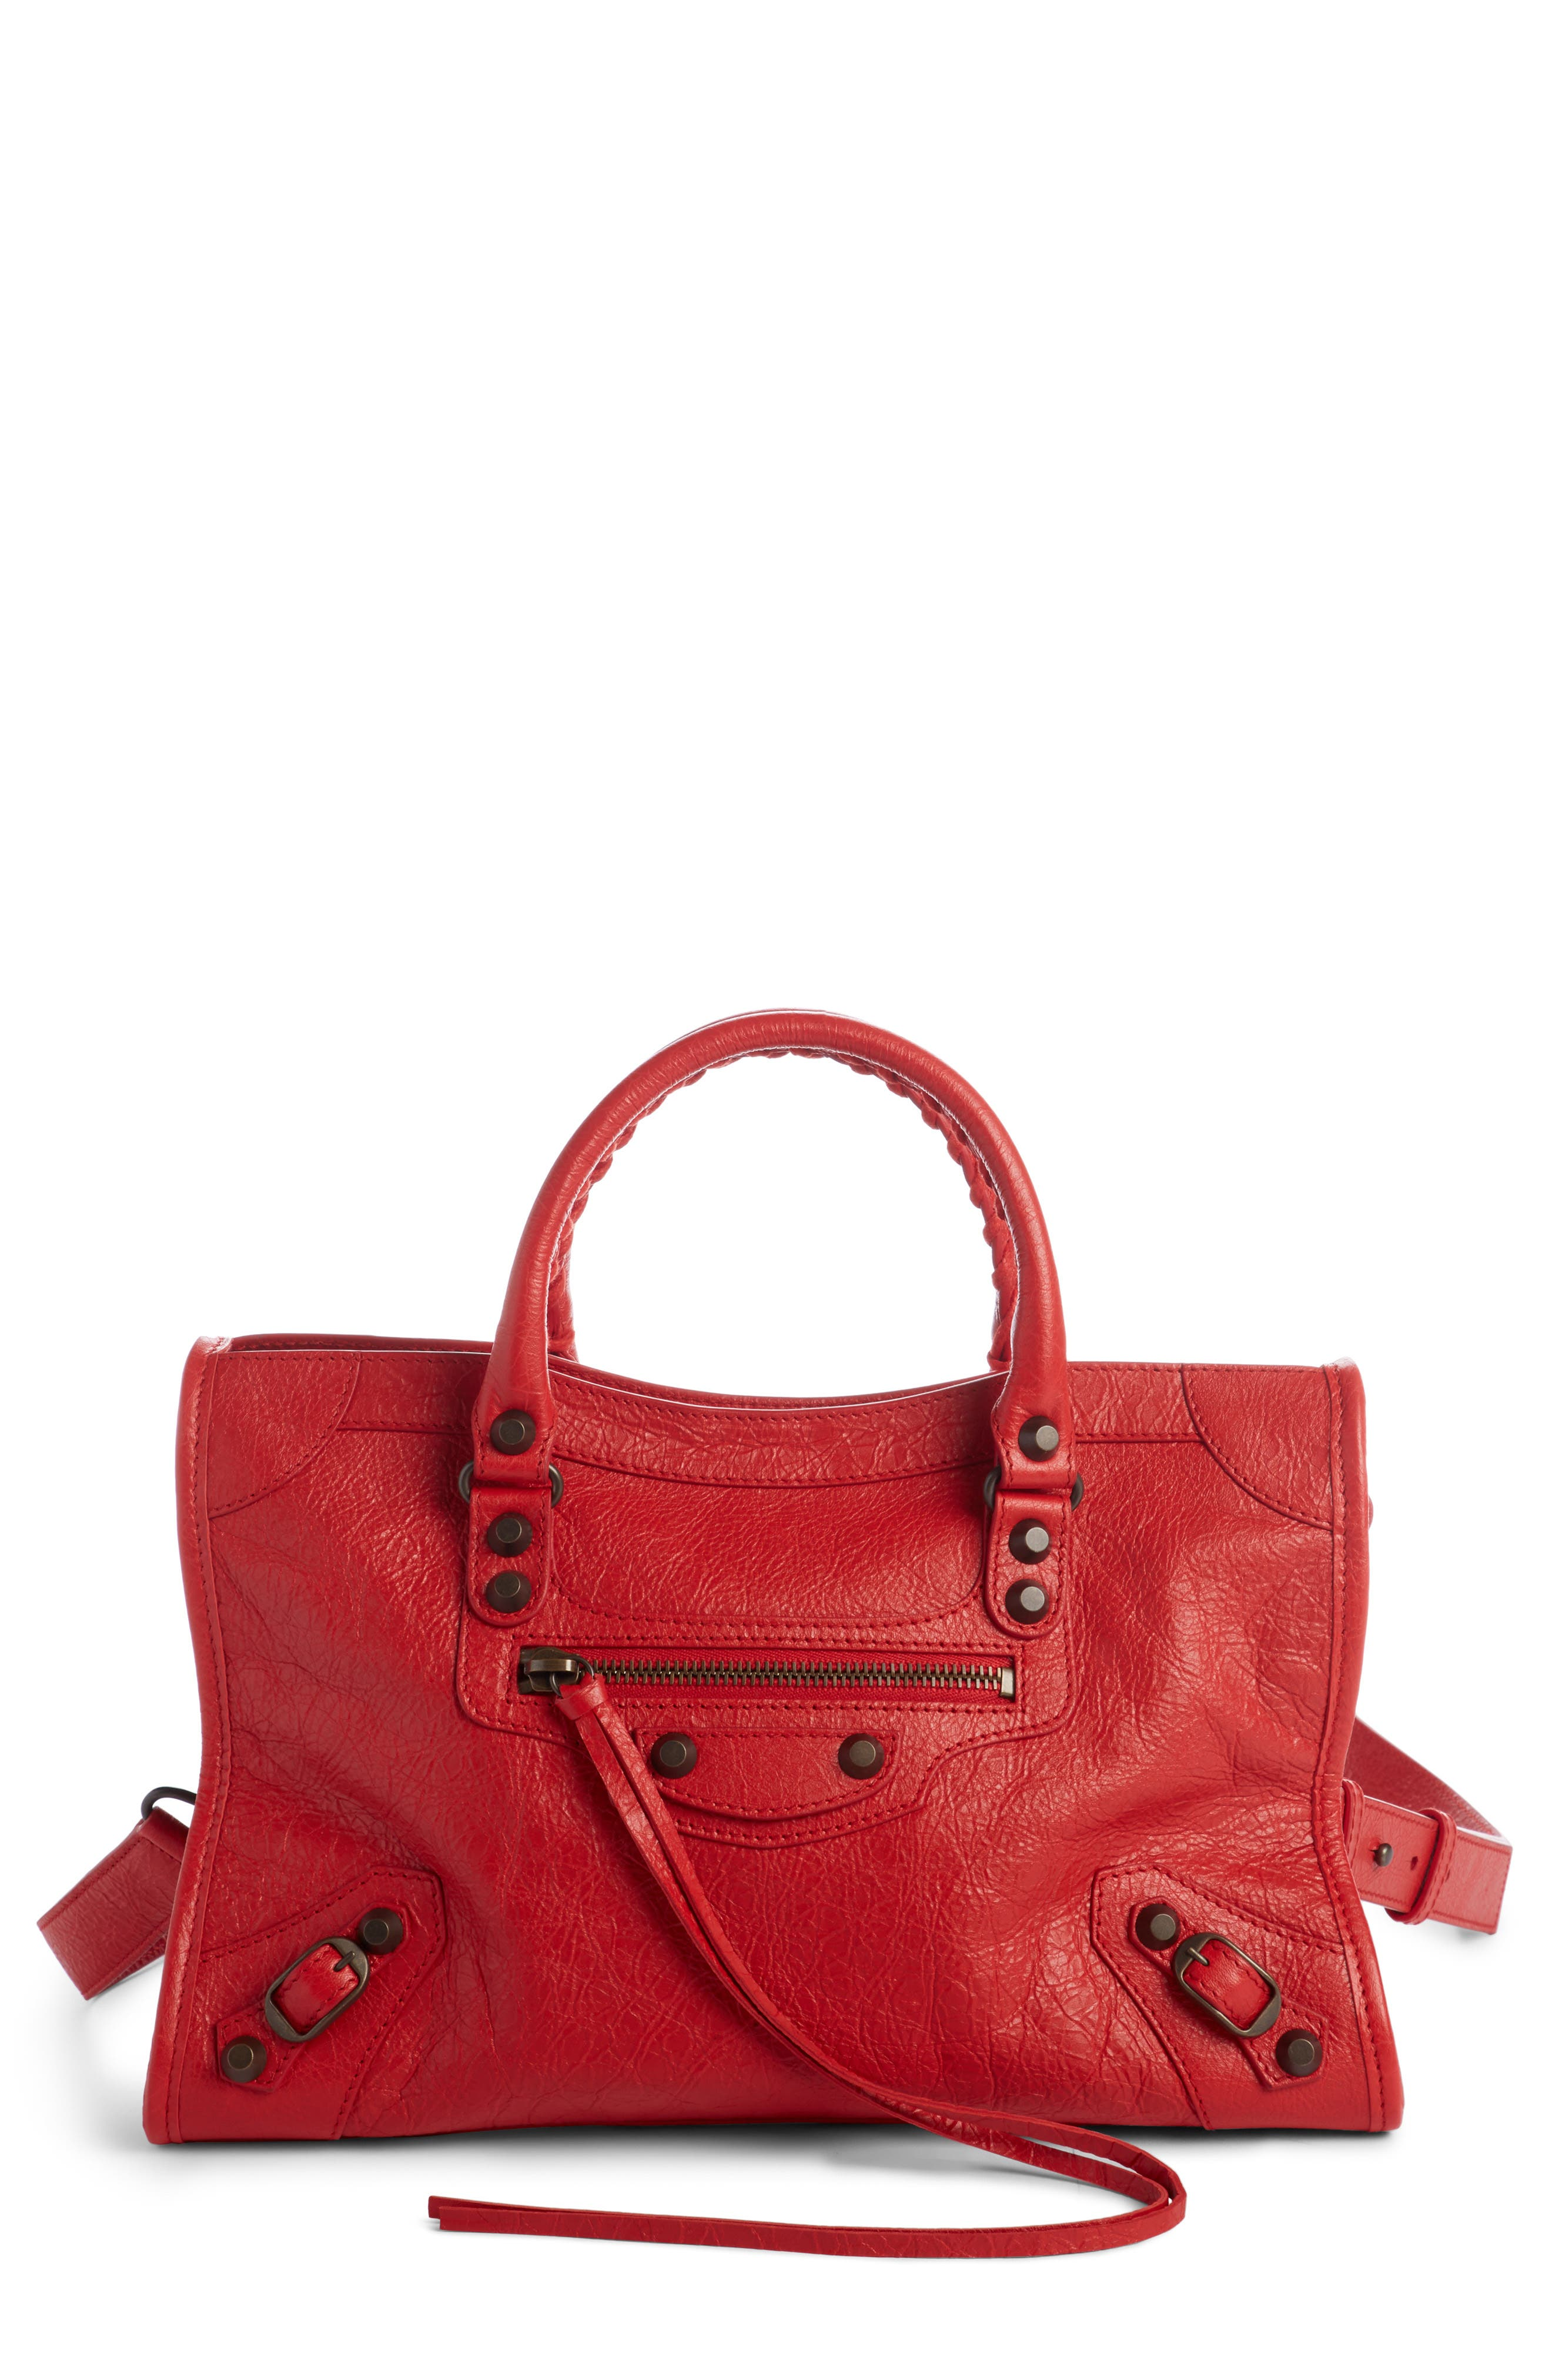 Alternate Image 1 Selected - Balenciaga Classic City Leather Tote